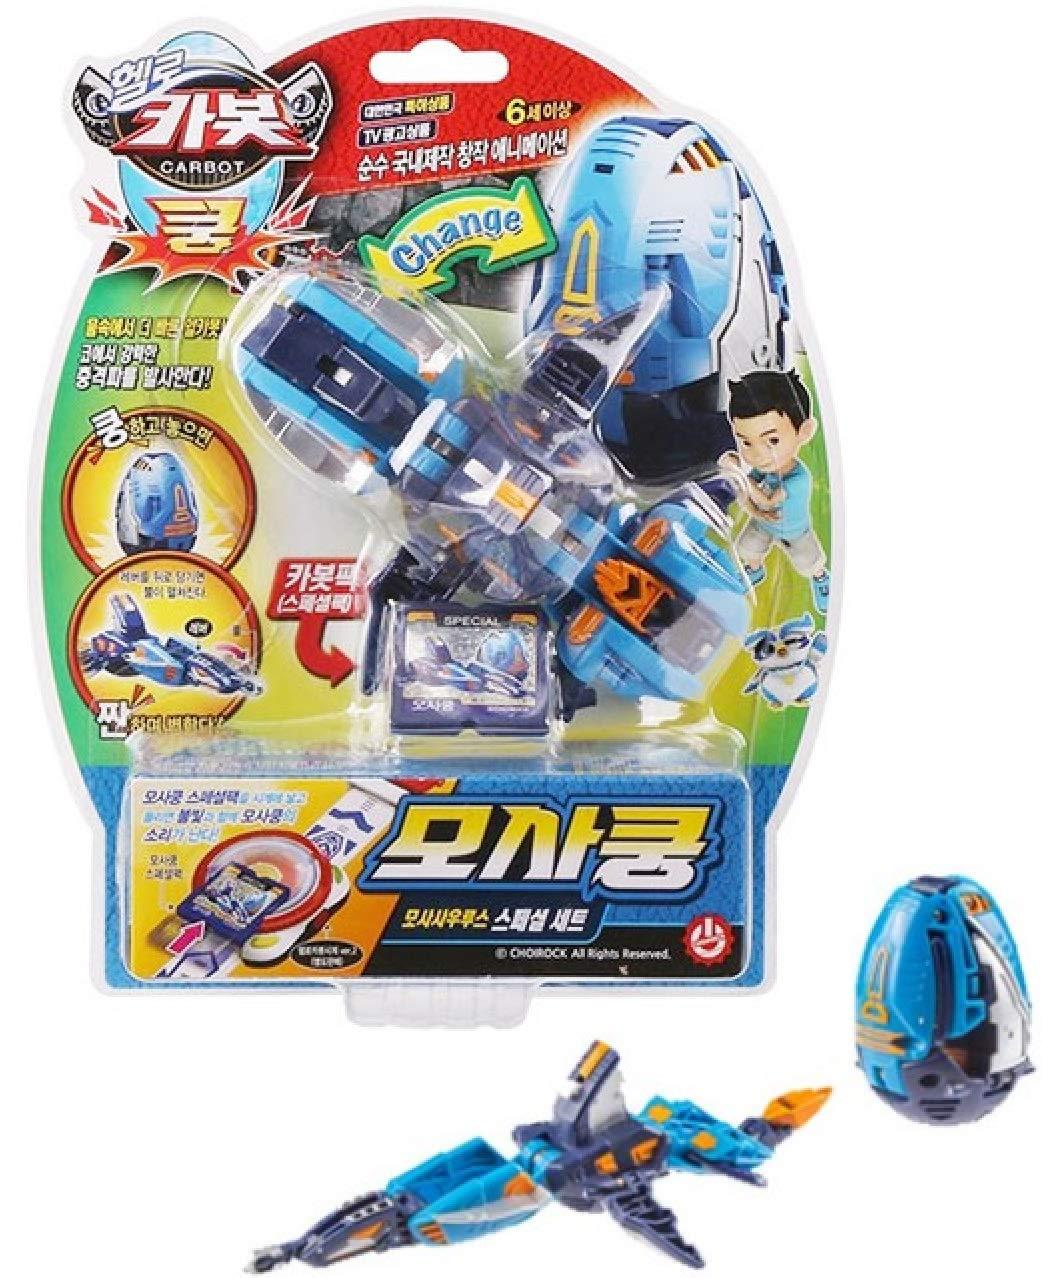 Hello Carbot Kung SMILOKOONG Smilodon Dinosaur Transformer Egg Robot Toy Koong